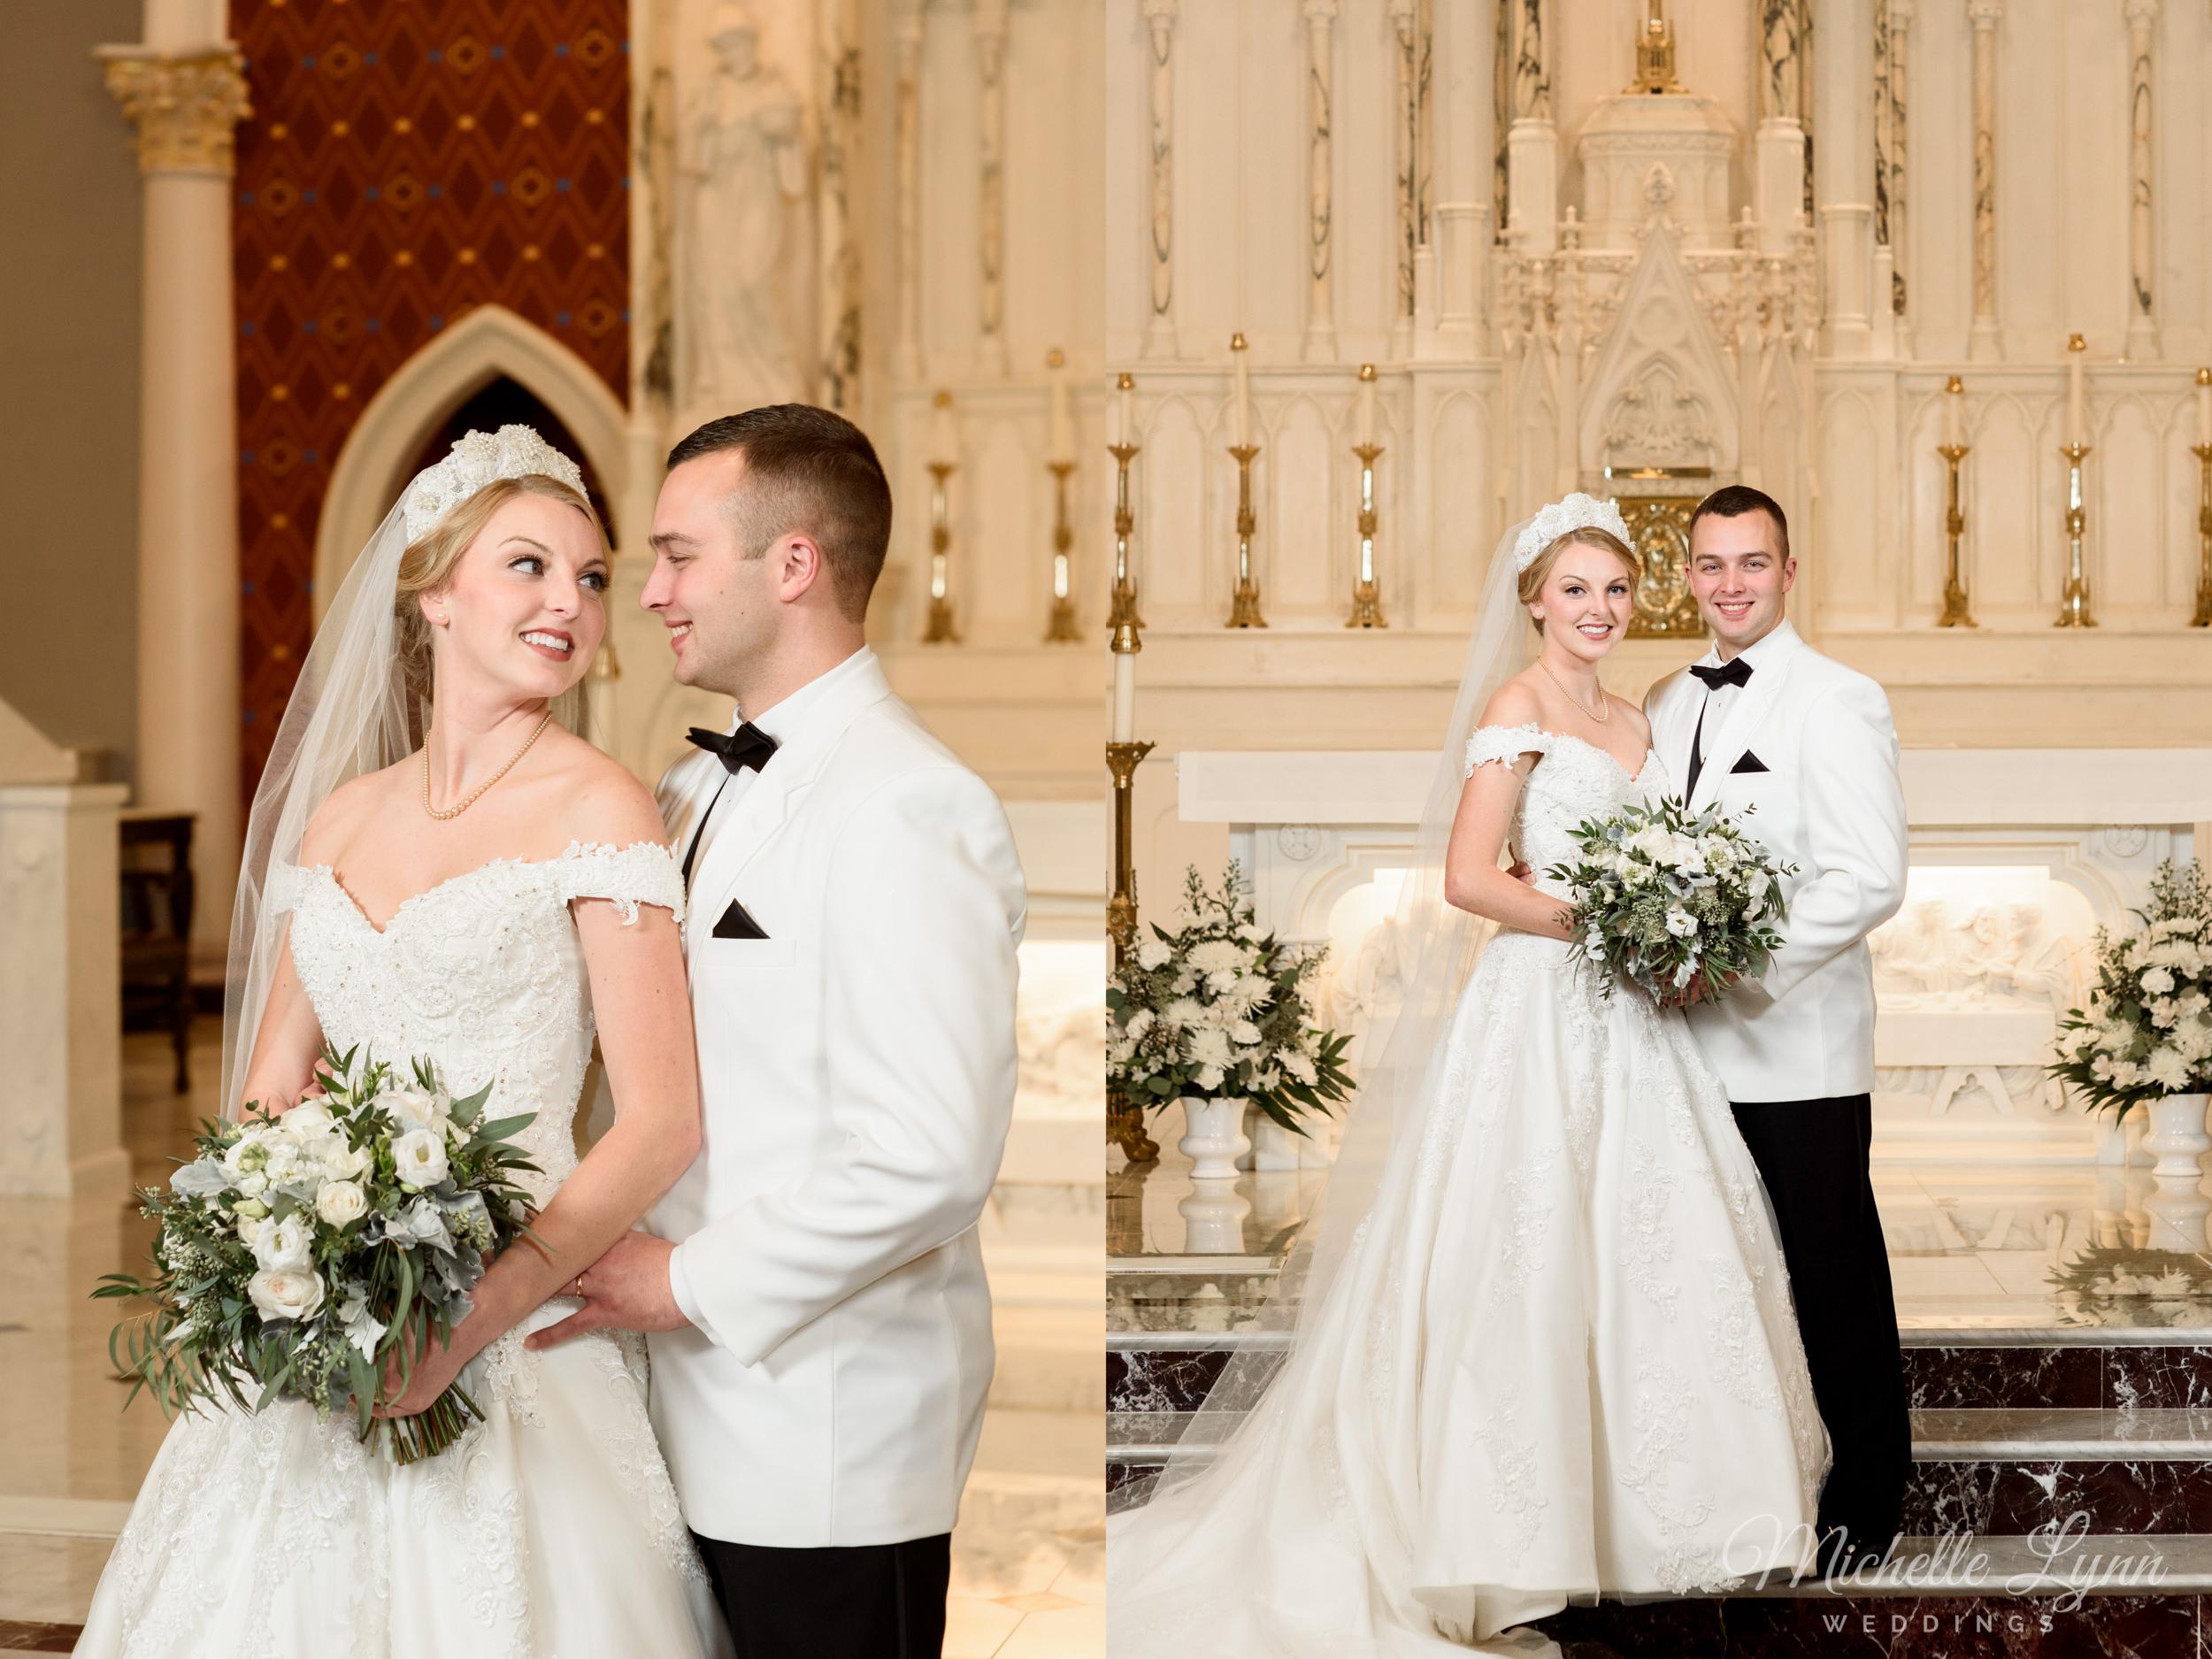 william-penn-inn-wedding-photography-mlw-73.jpg